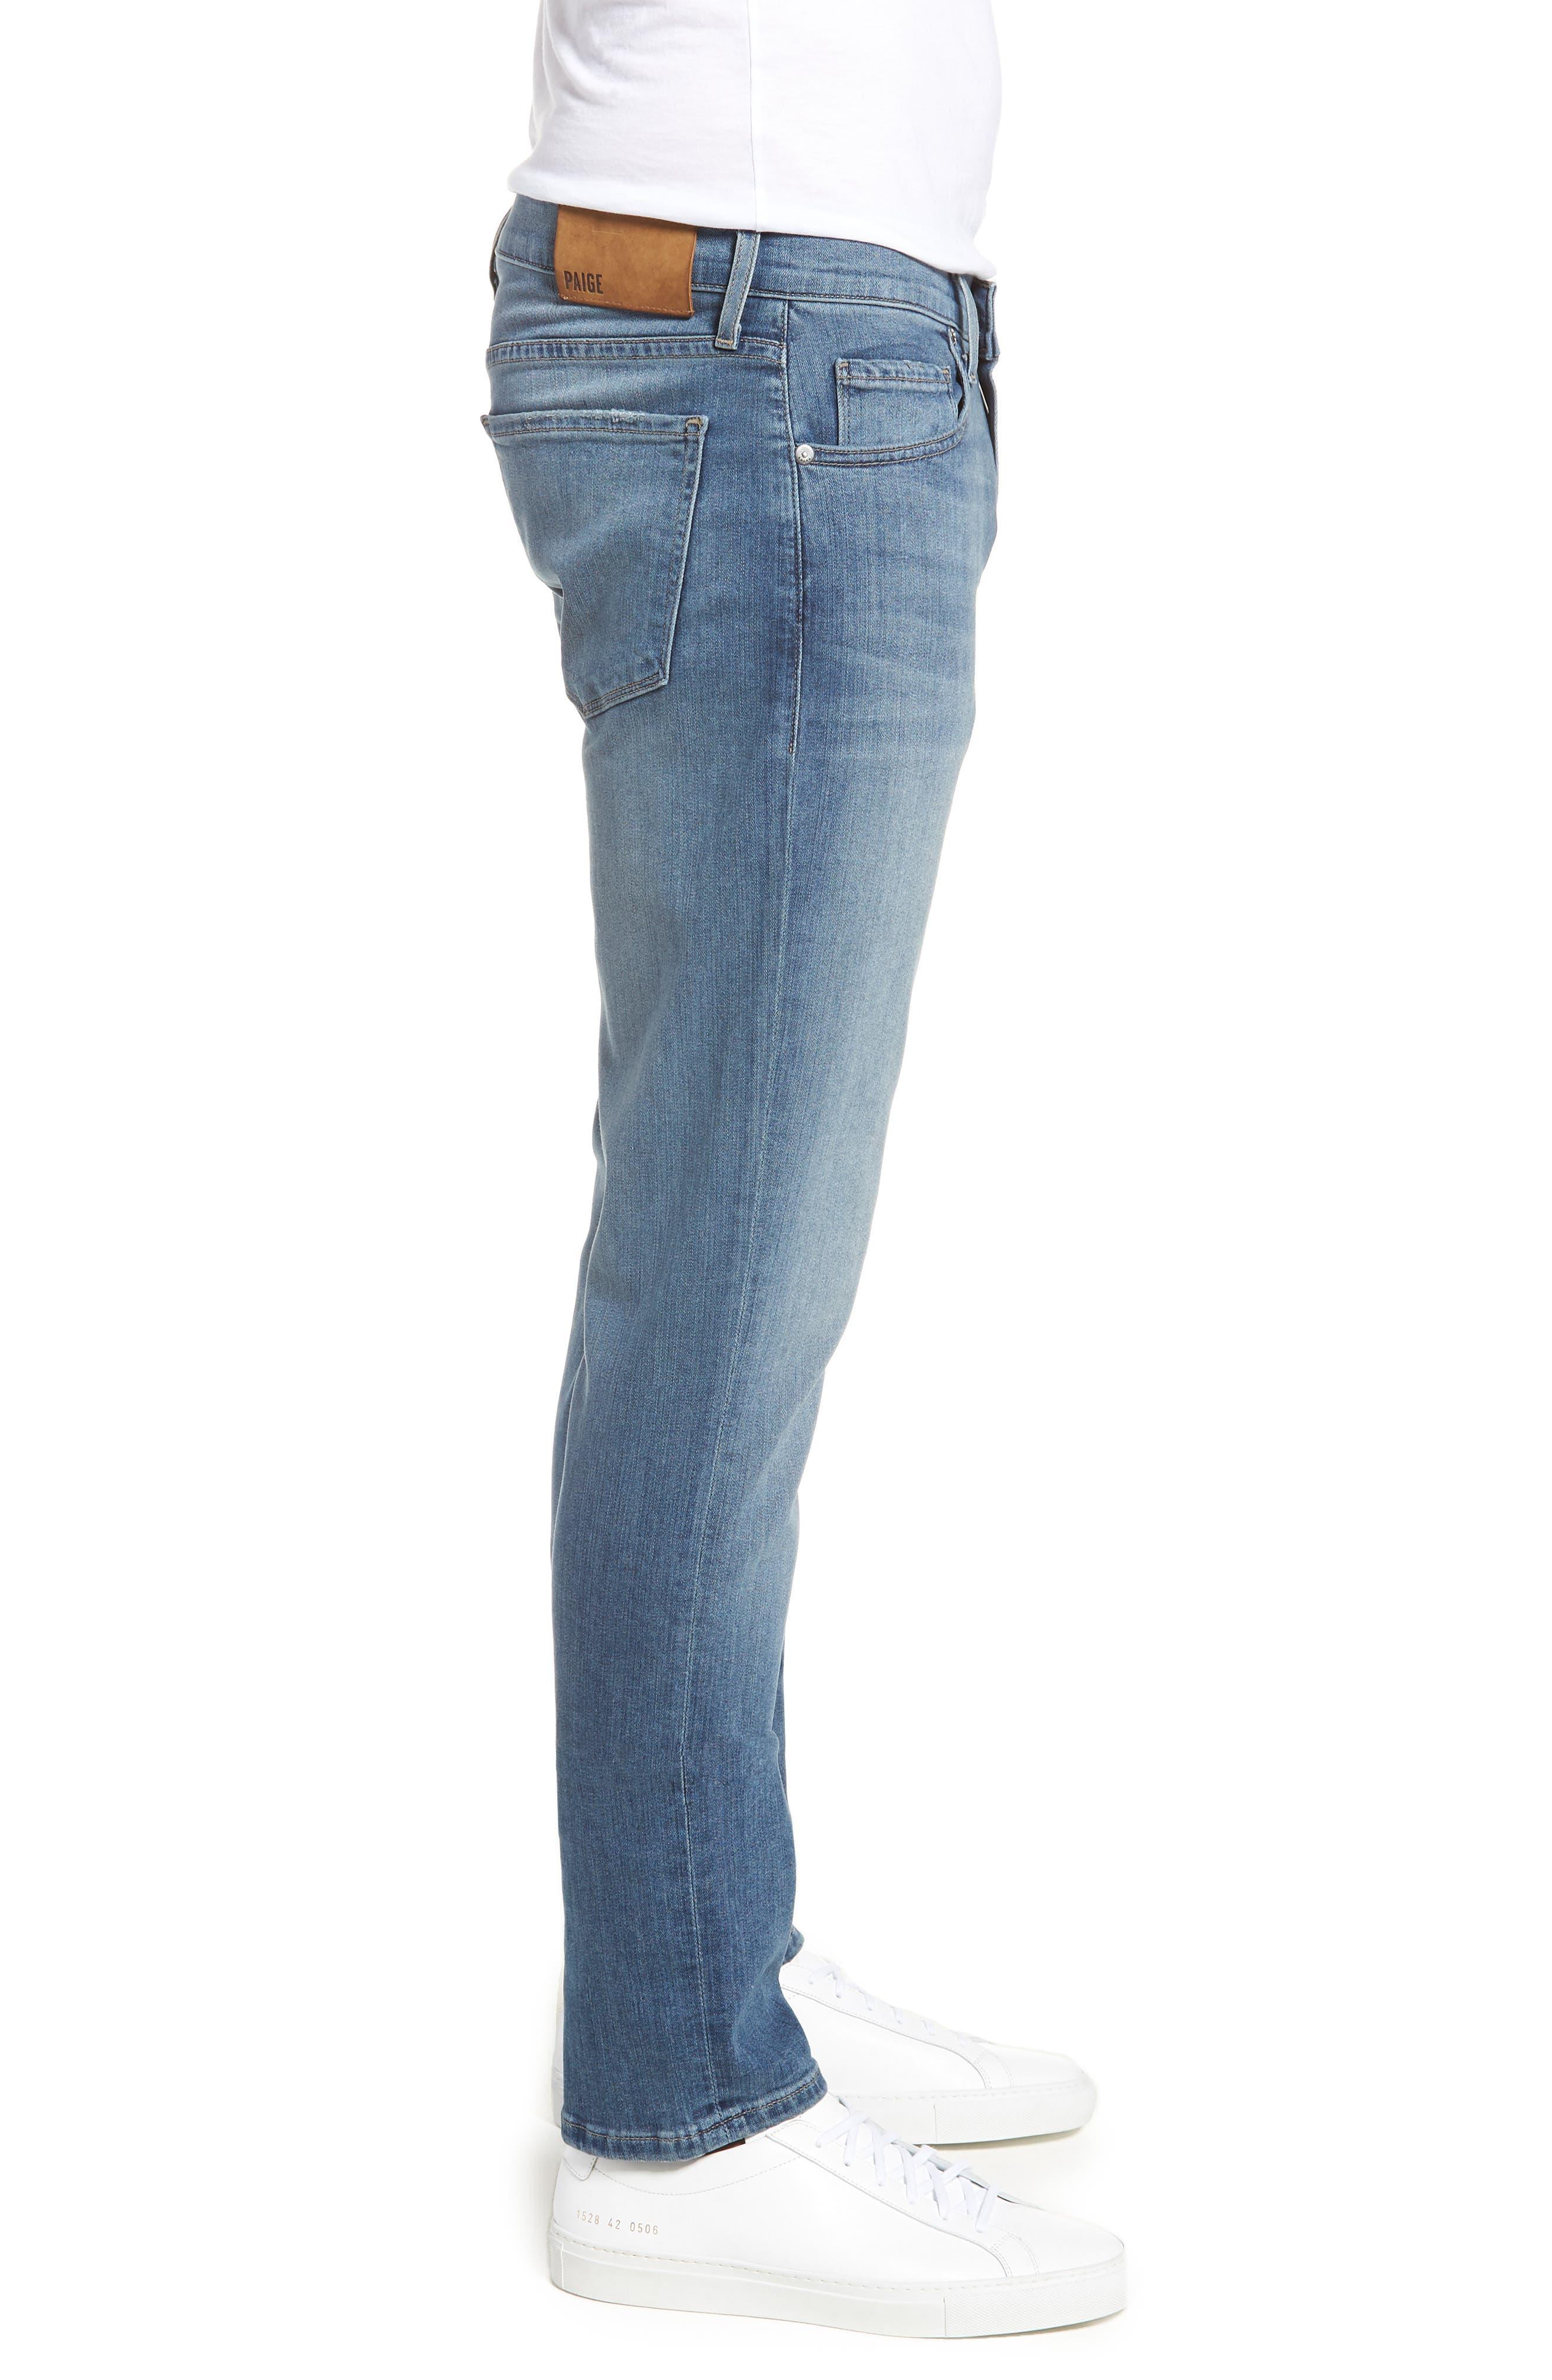 Transcend - Lennox Slim Fit Jeans,                             Alternate thumbnail 3, color,                             Allman